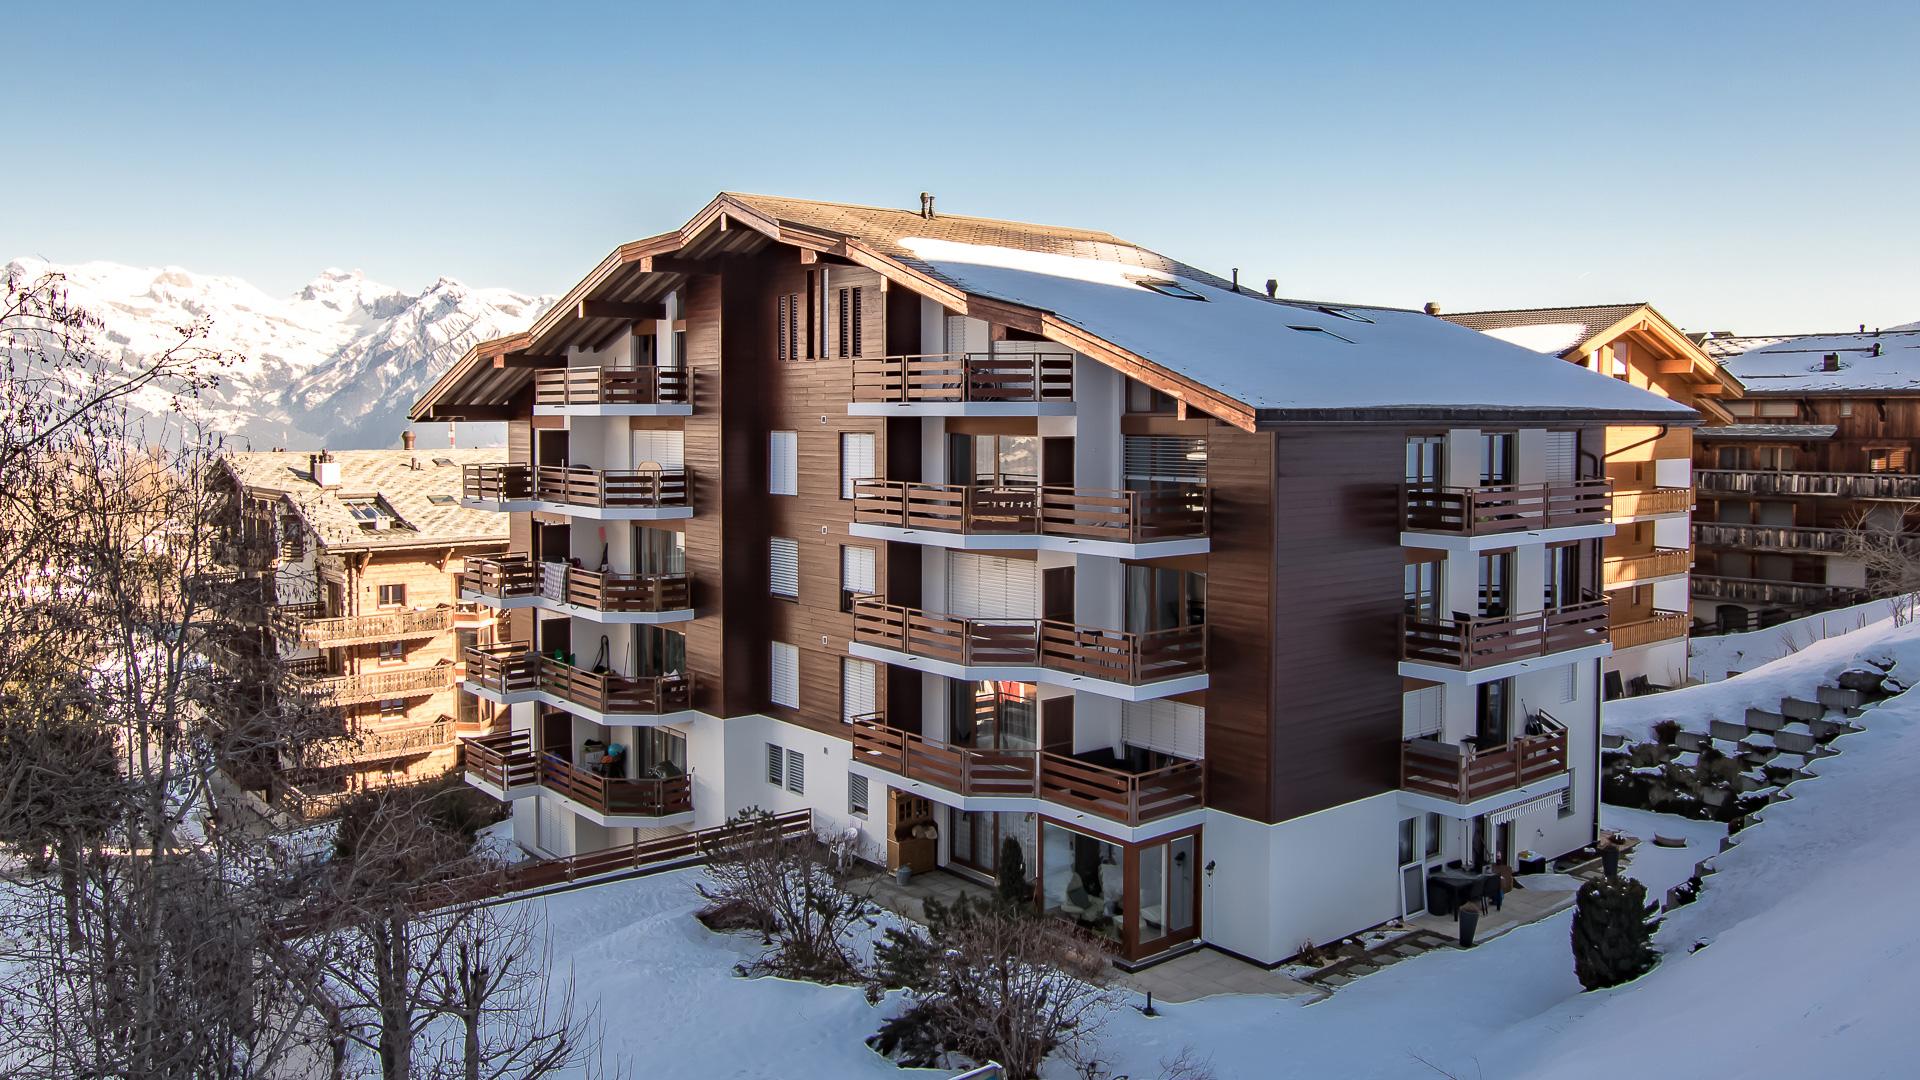 Madison Apt Apartments, Switzerland